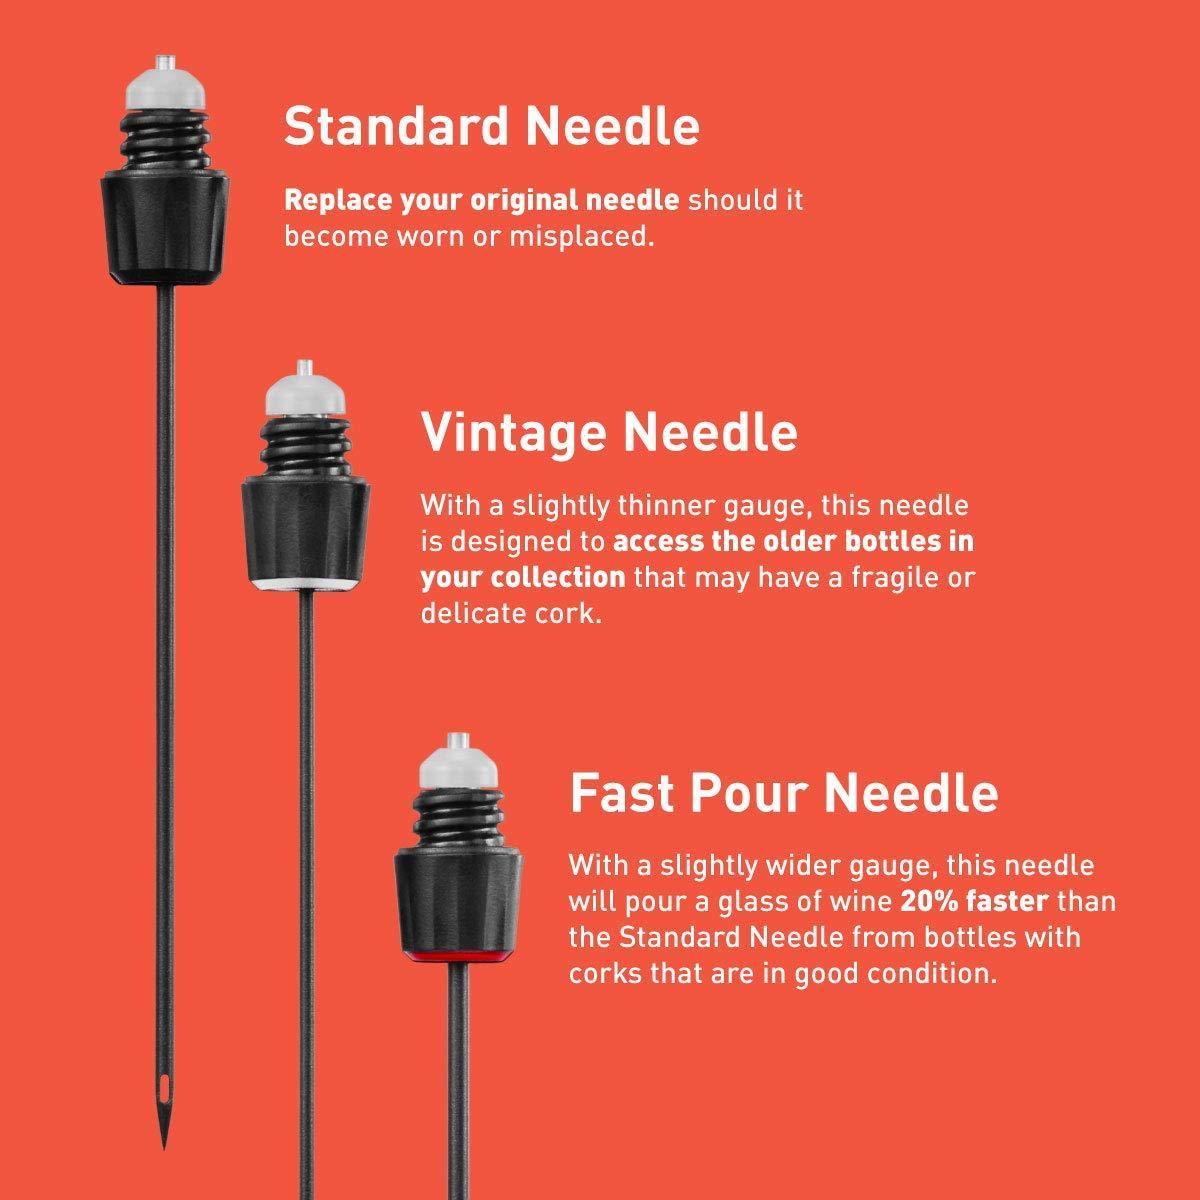 "/""BRAND NEW/"" Coravin Wine Preservation System 3 Needle Kit"